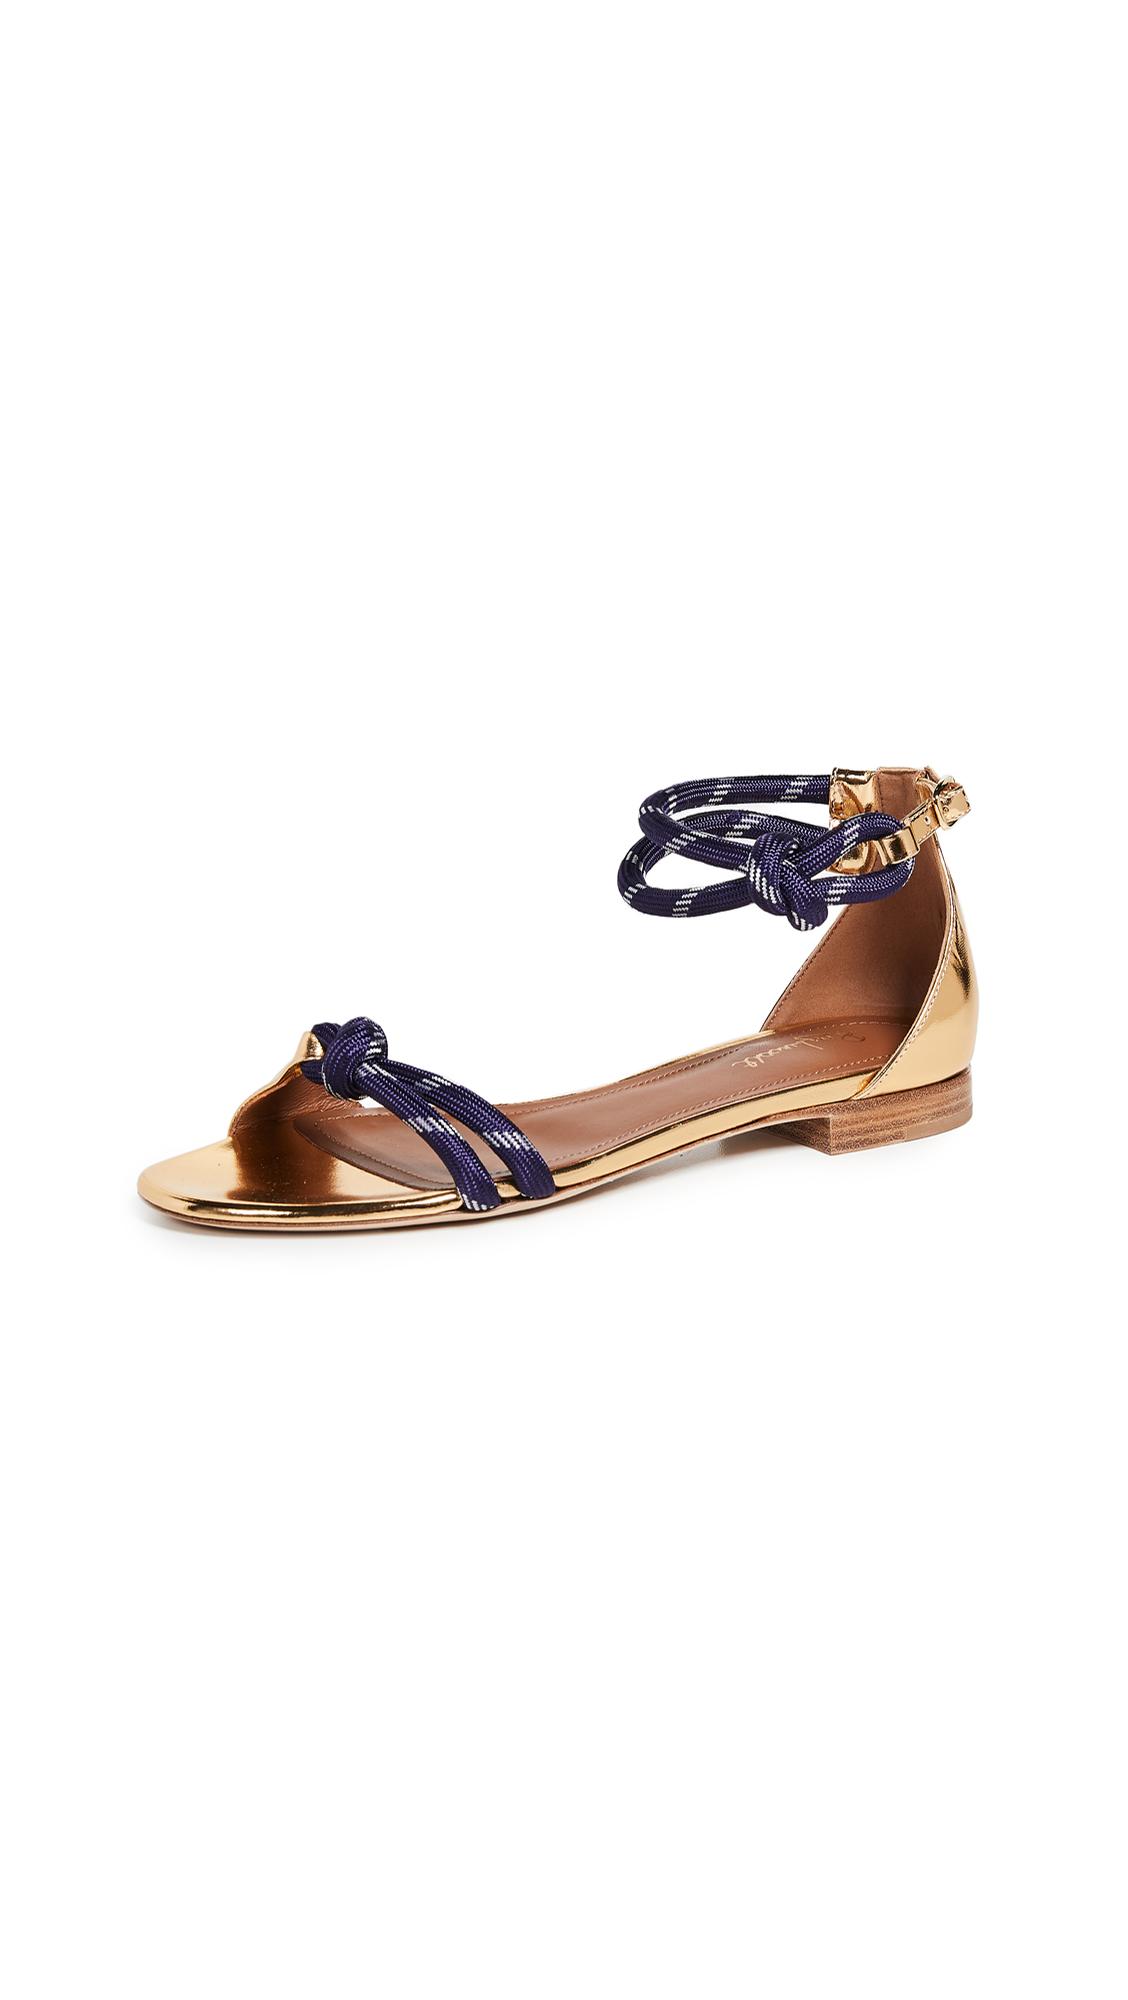 Malone Souliers Fenn Flat Sandals - Gold/Navy